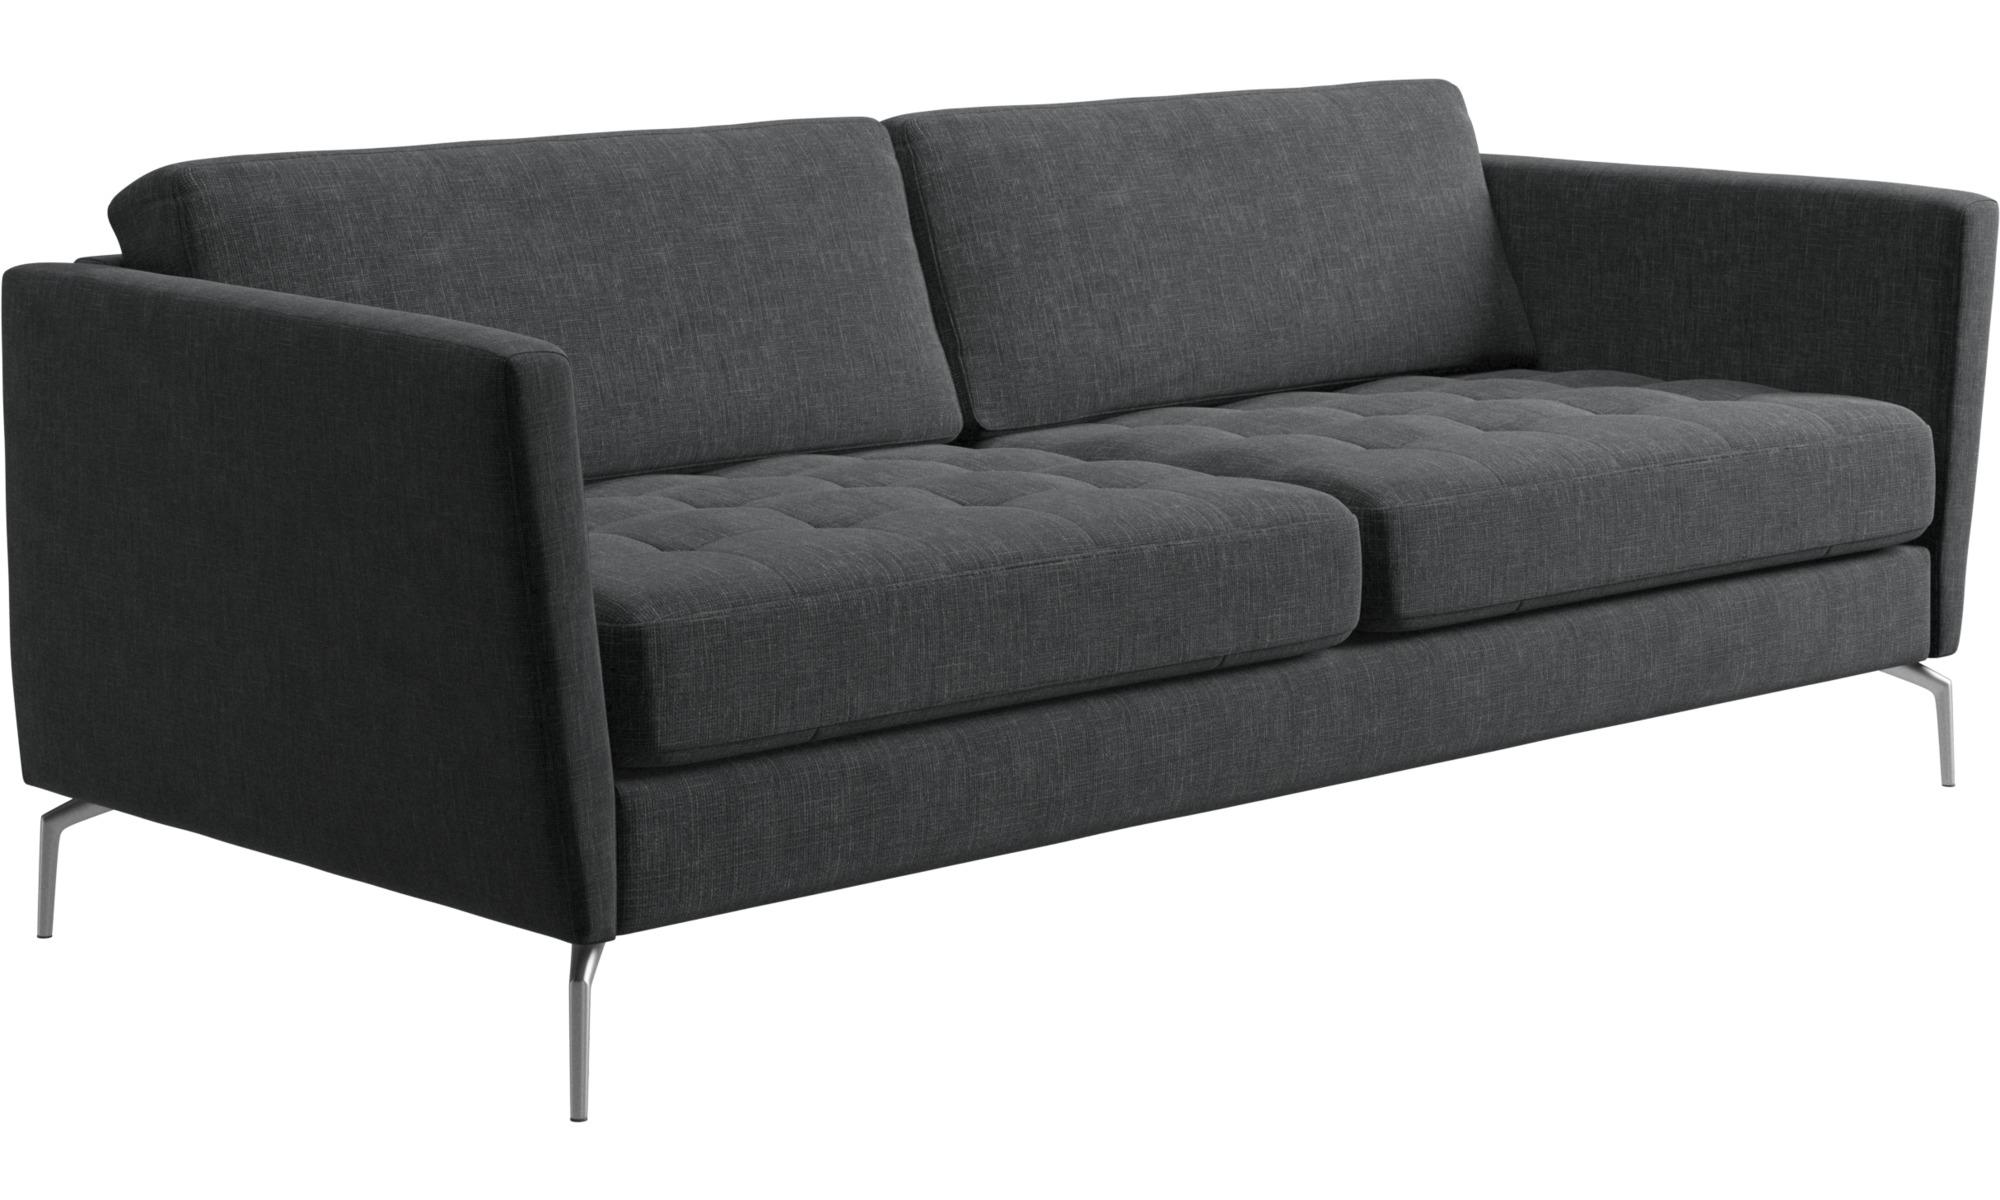 2 5 Seater Sofas Osaka Sofa Tufted Seat Gray Fabric